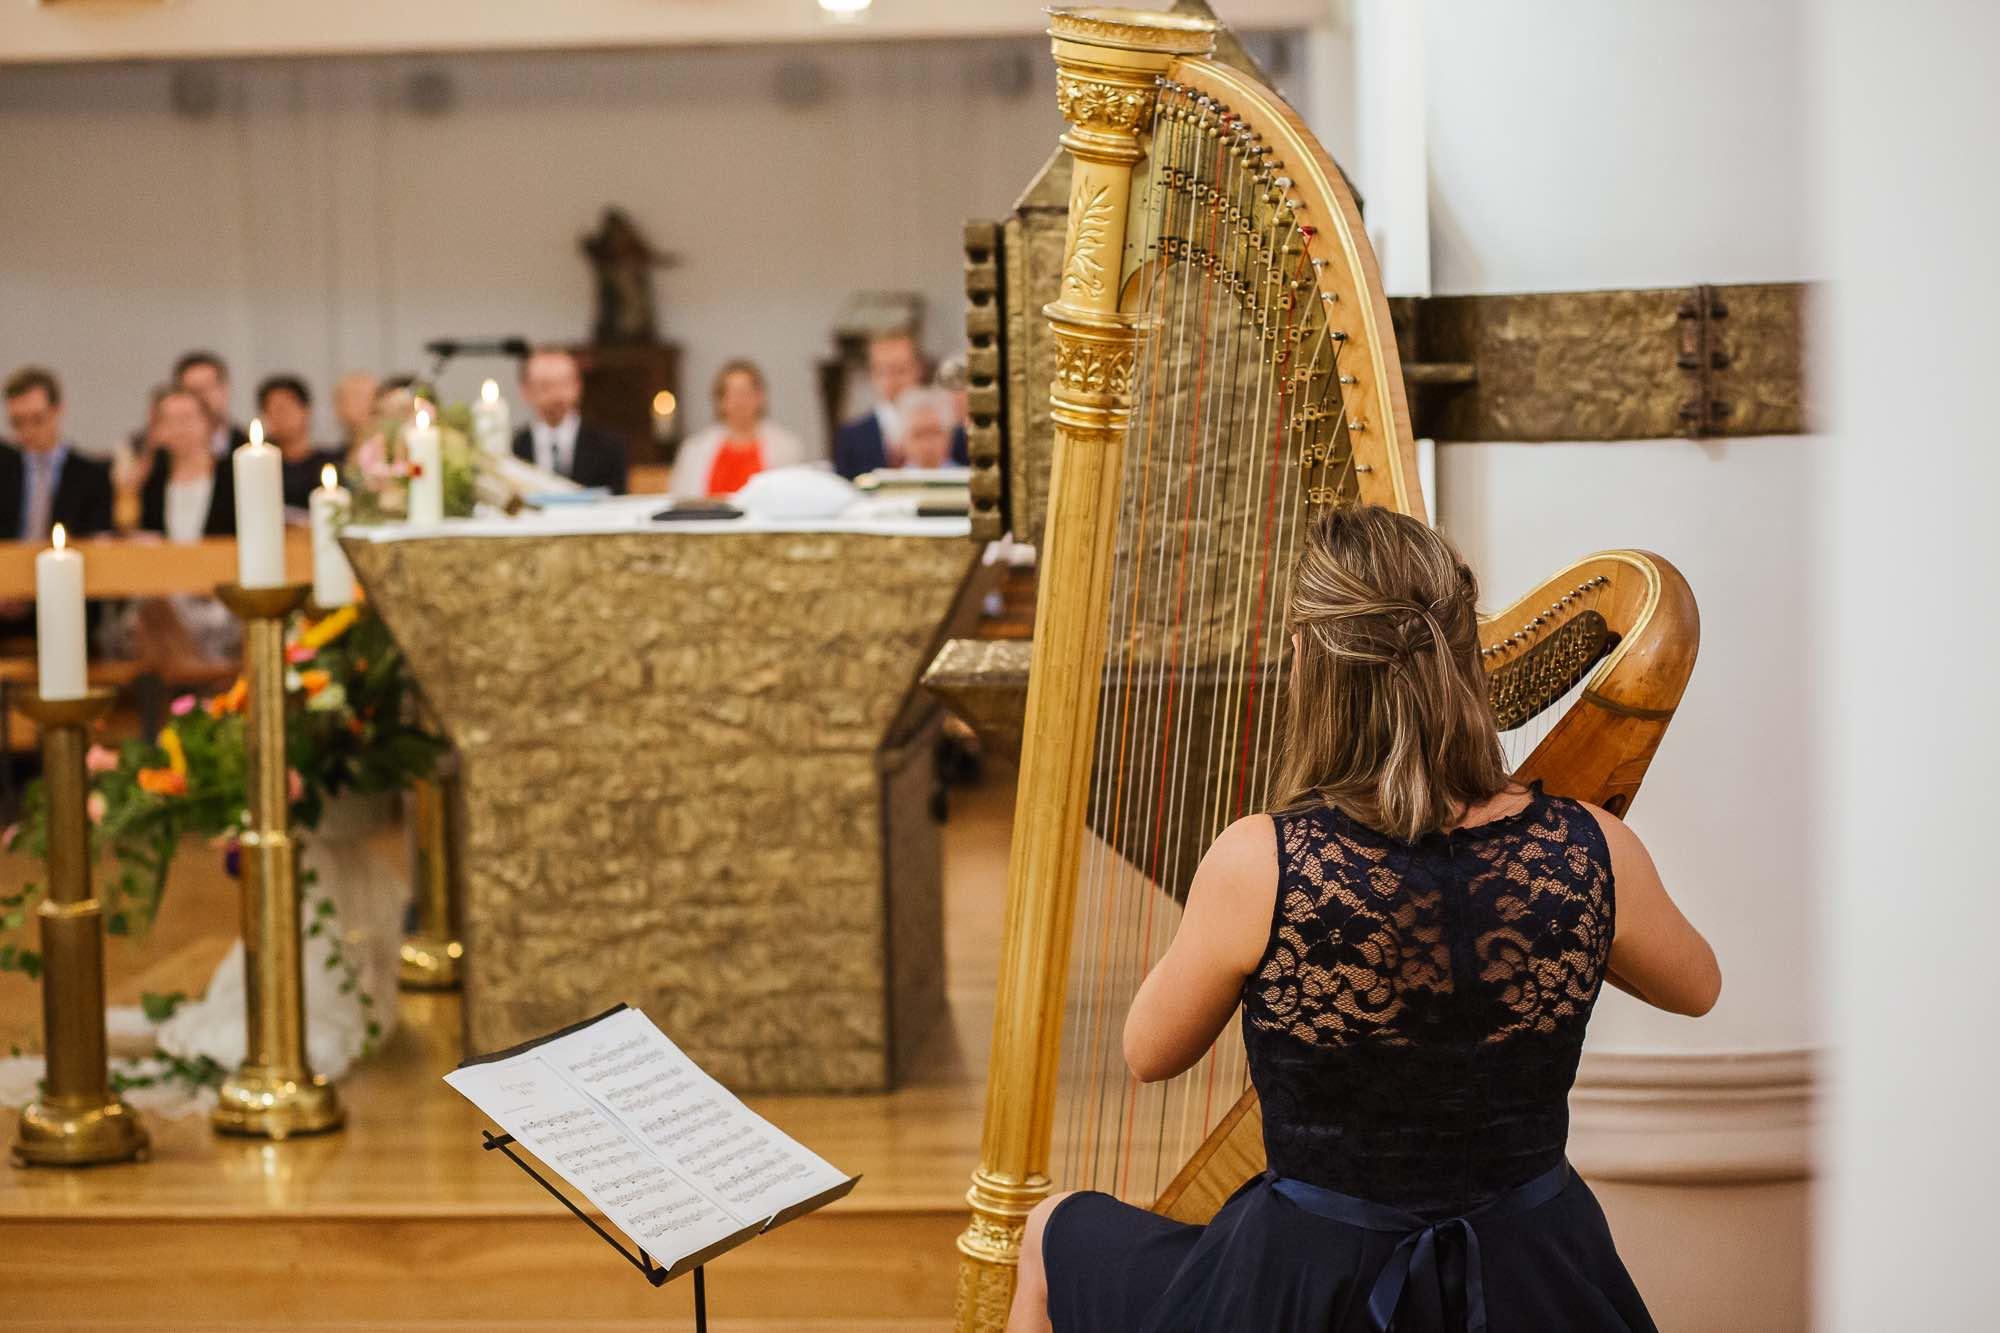 Harfe in Kirche Konzert